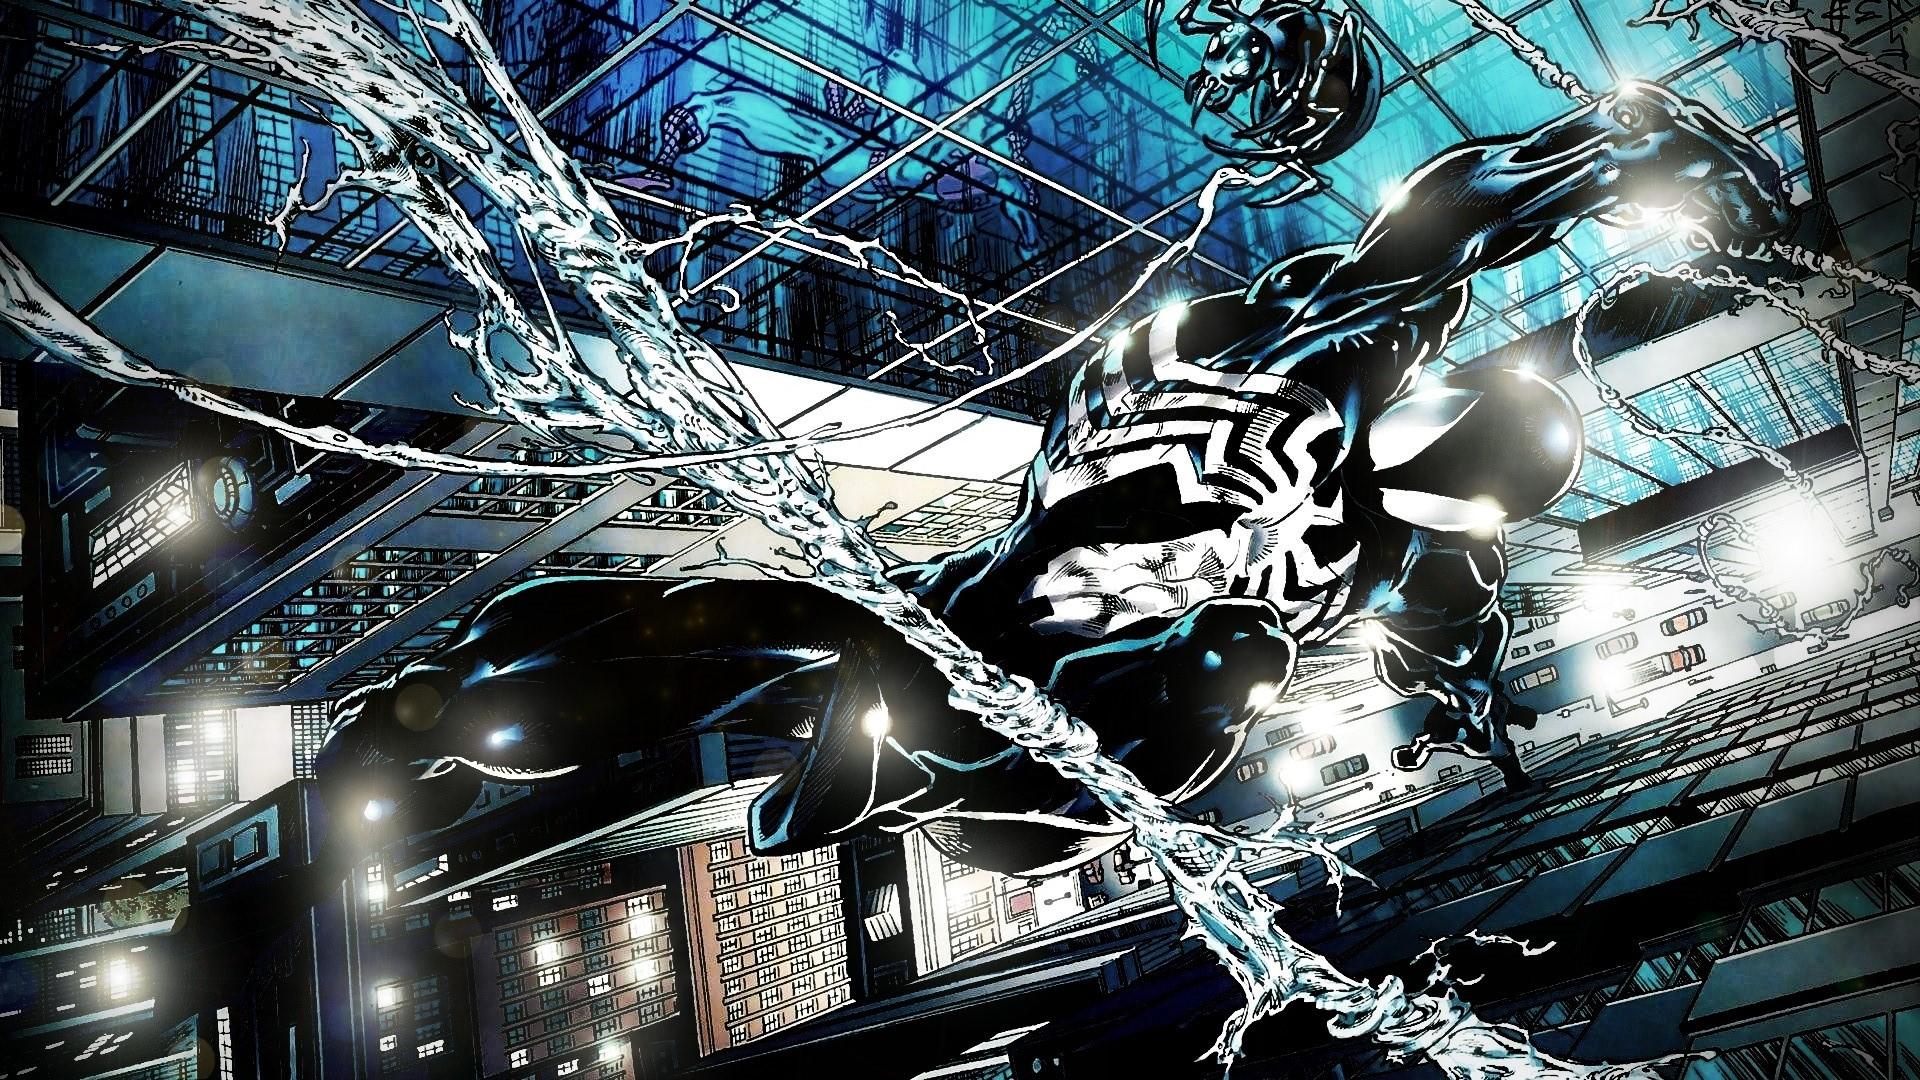 The Sensational Spider-Man by ProfessorAdagio